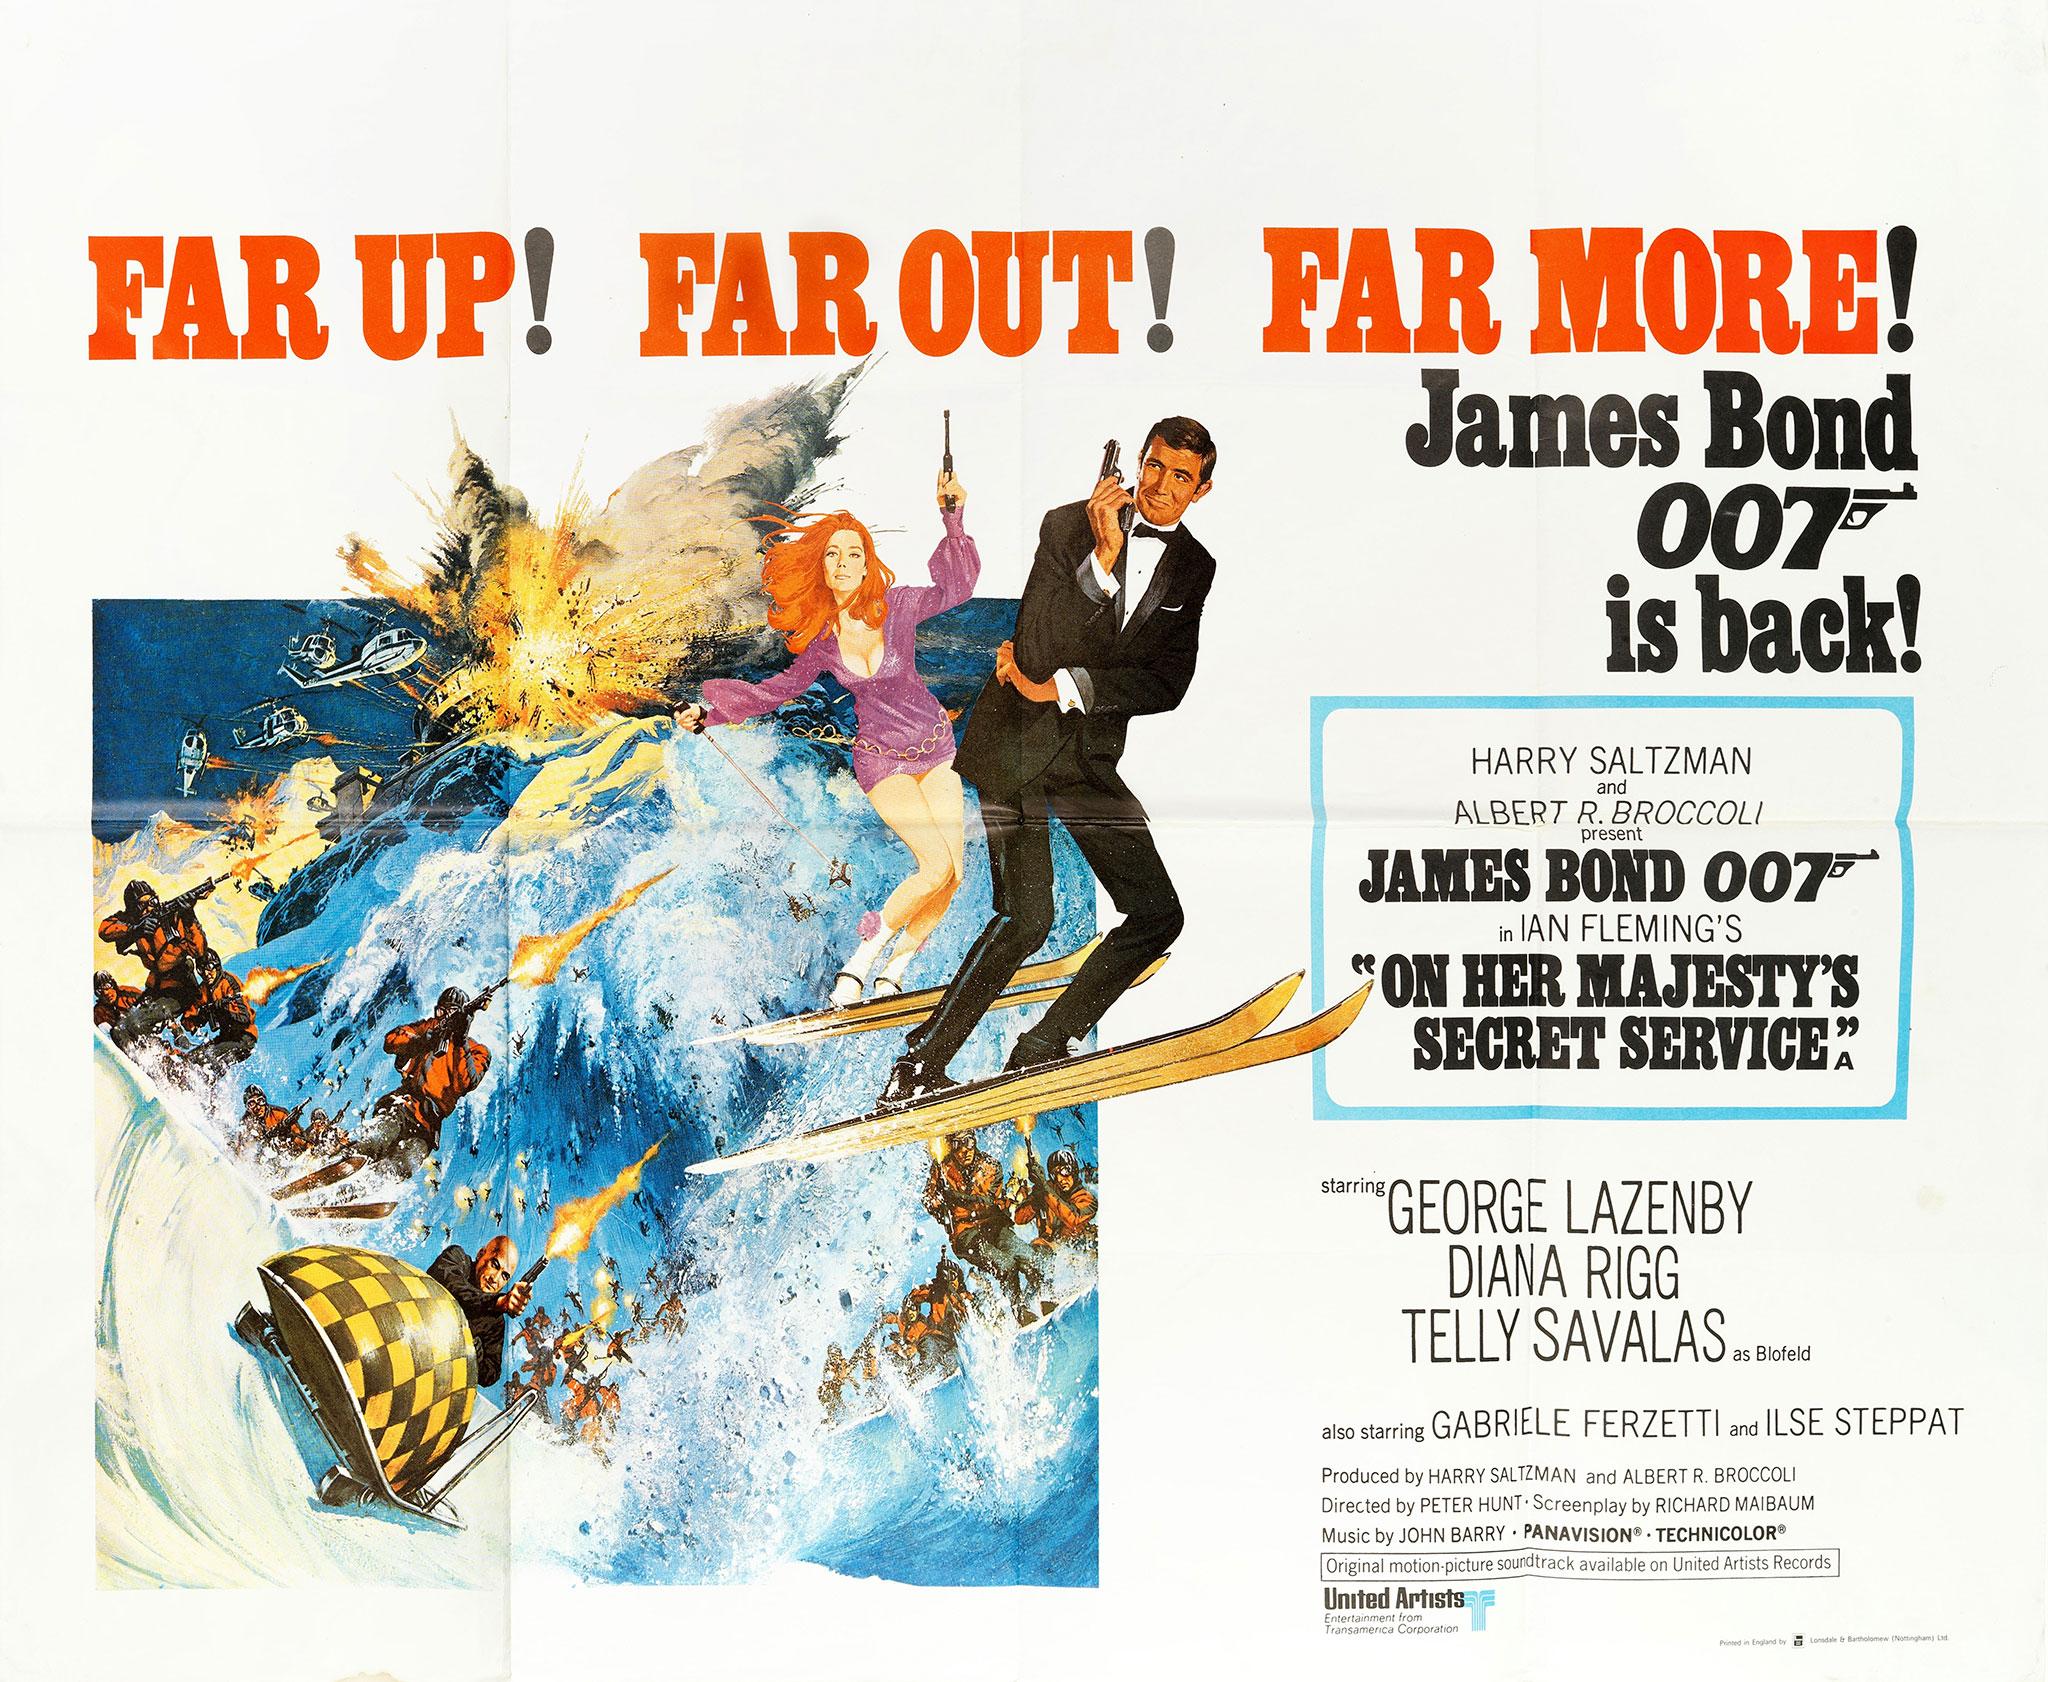 1969 On Her Majesty's Secret Service original James Bond film poster - Bonhams Bond Street Sale